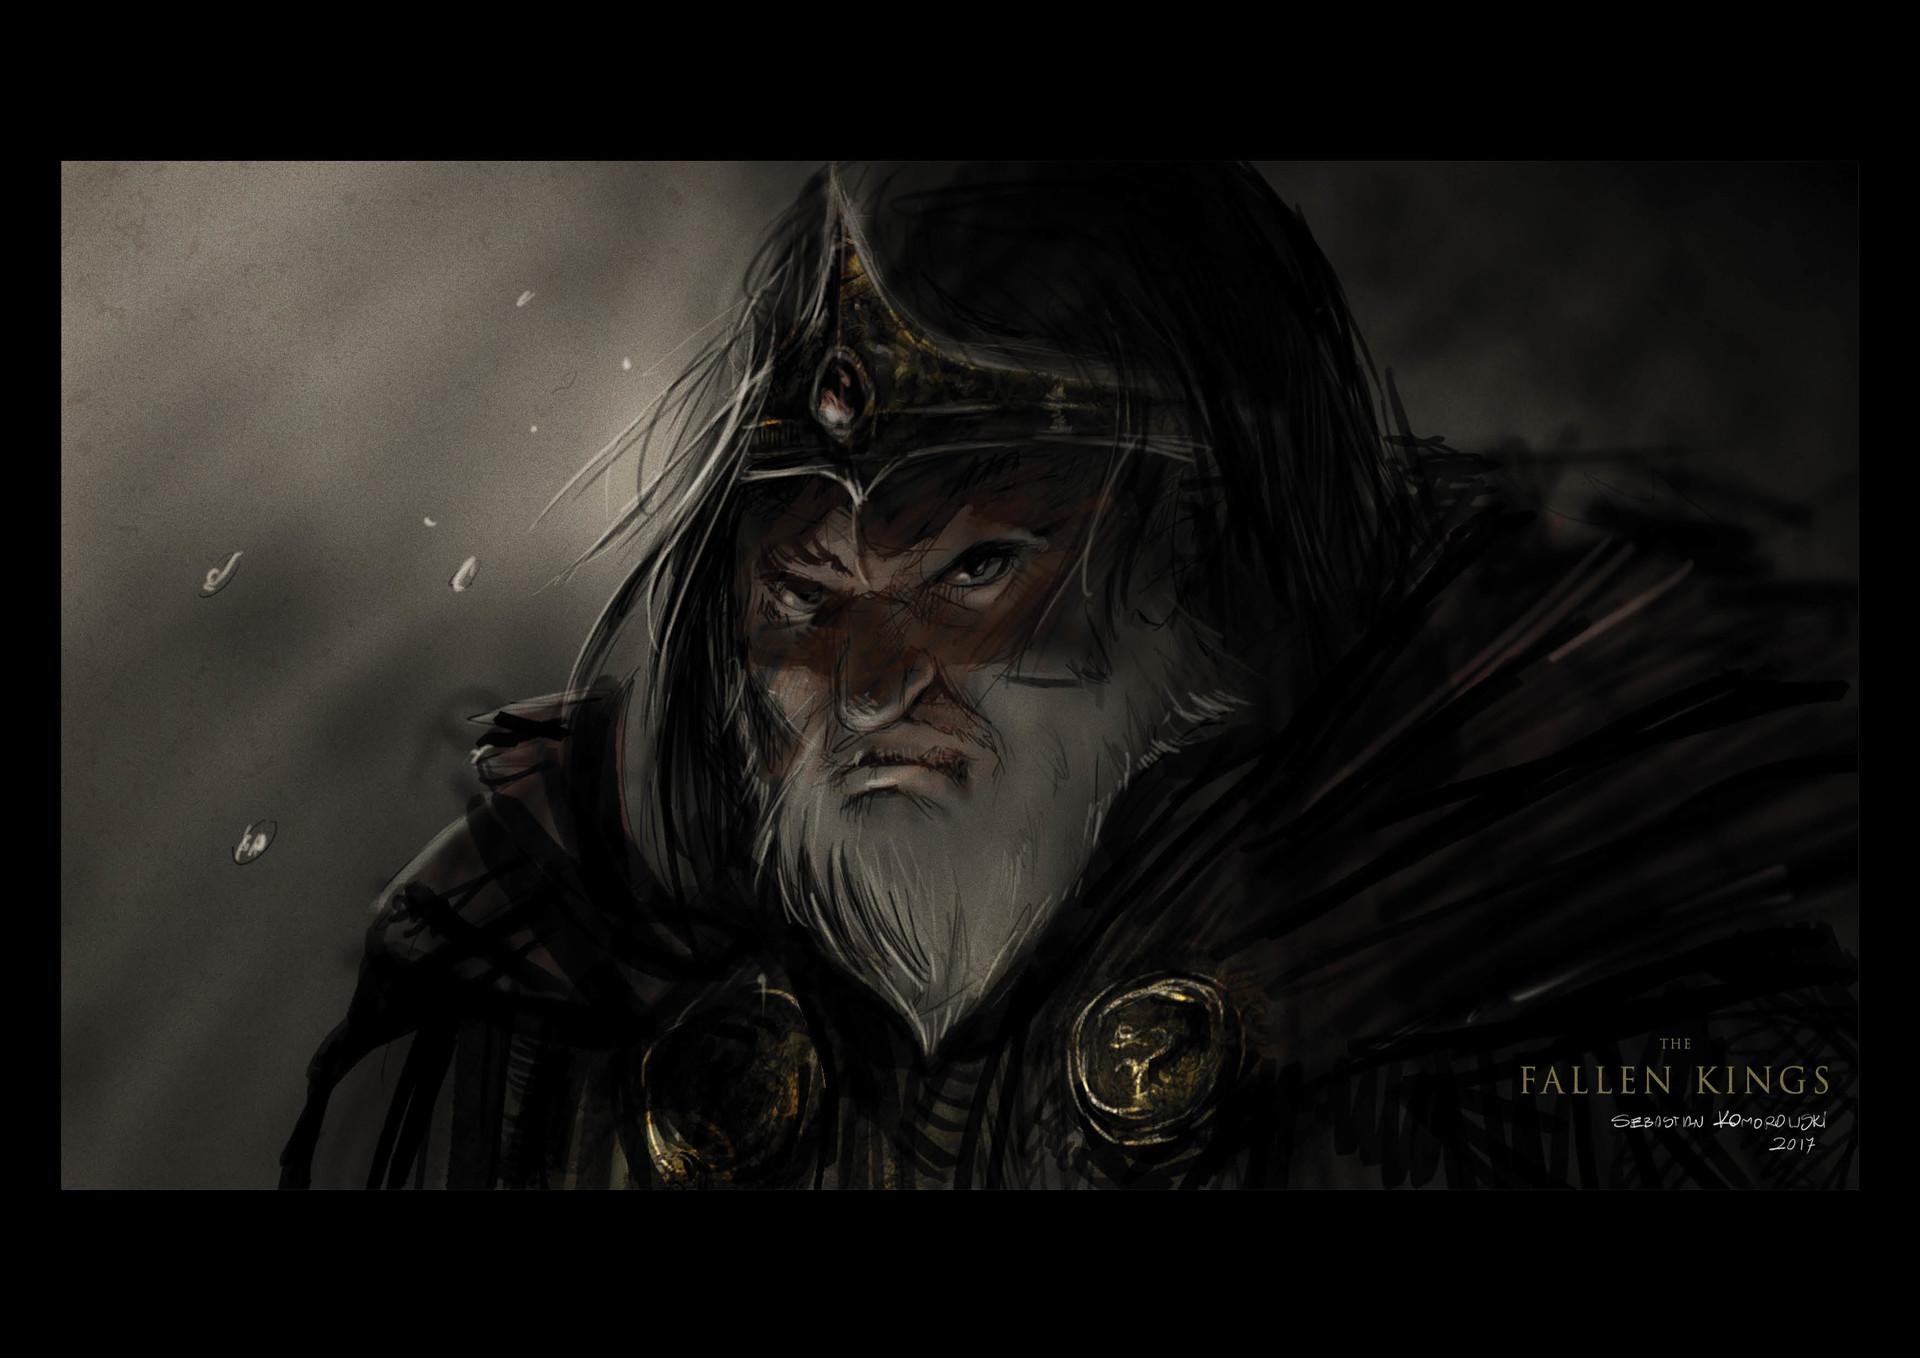 Sebastian komorowski greedy king